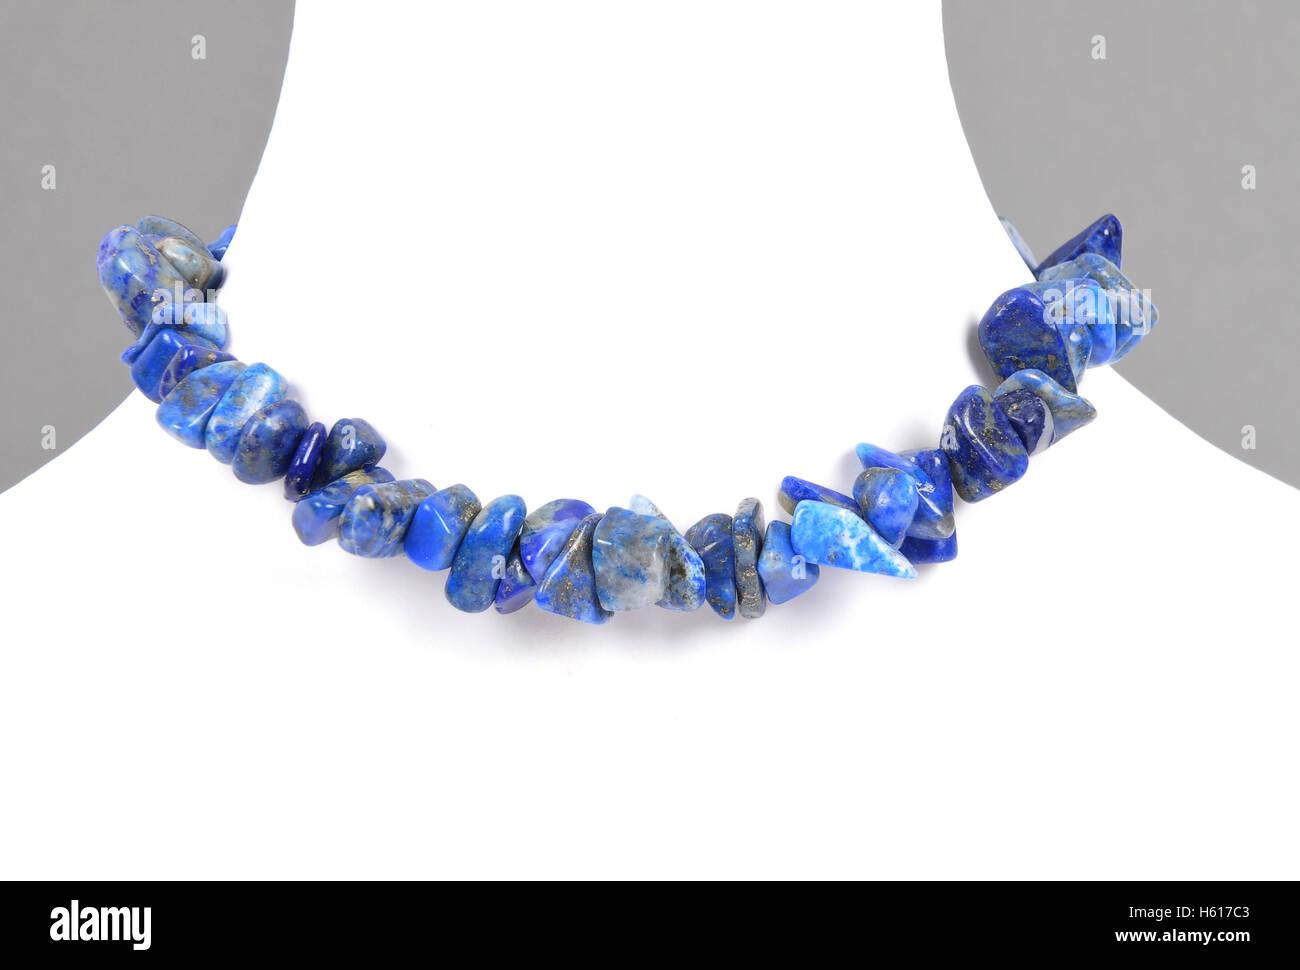 Lapis Lazuli Bracelet Stockfotos und bilder Kaufen Alamy